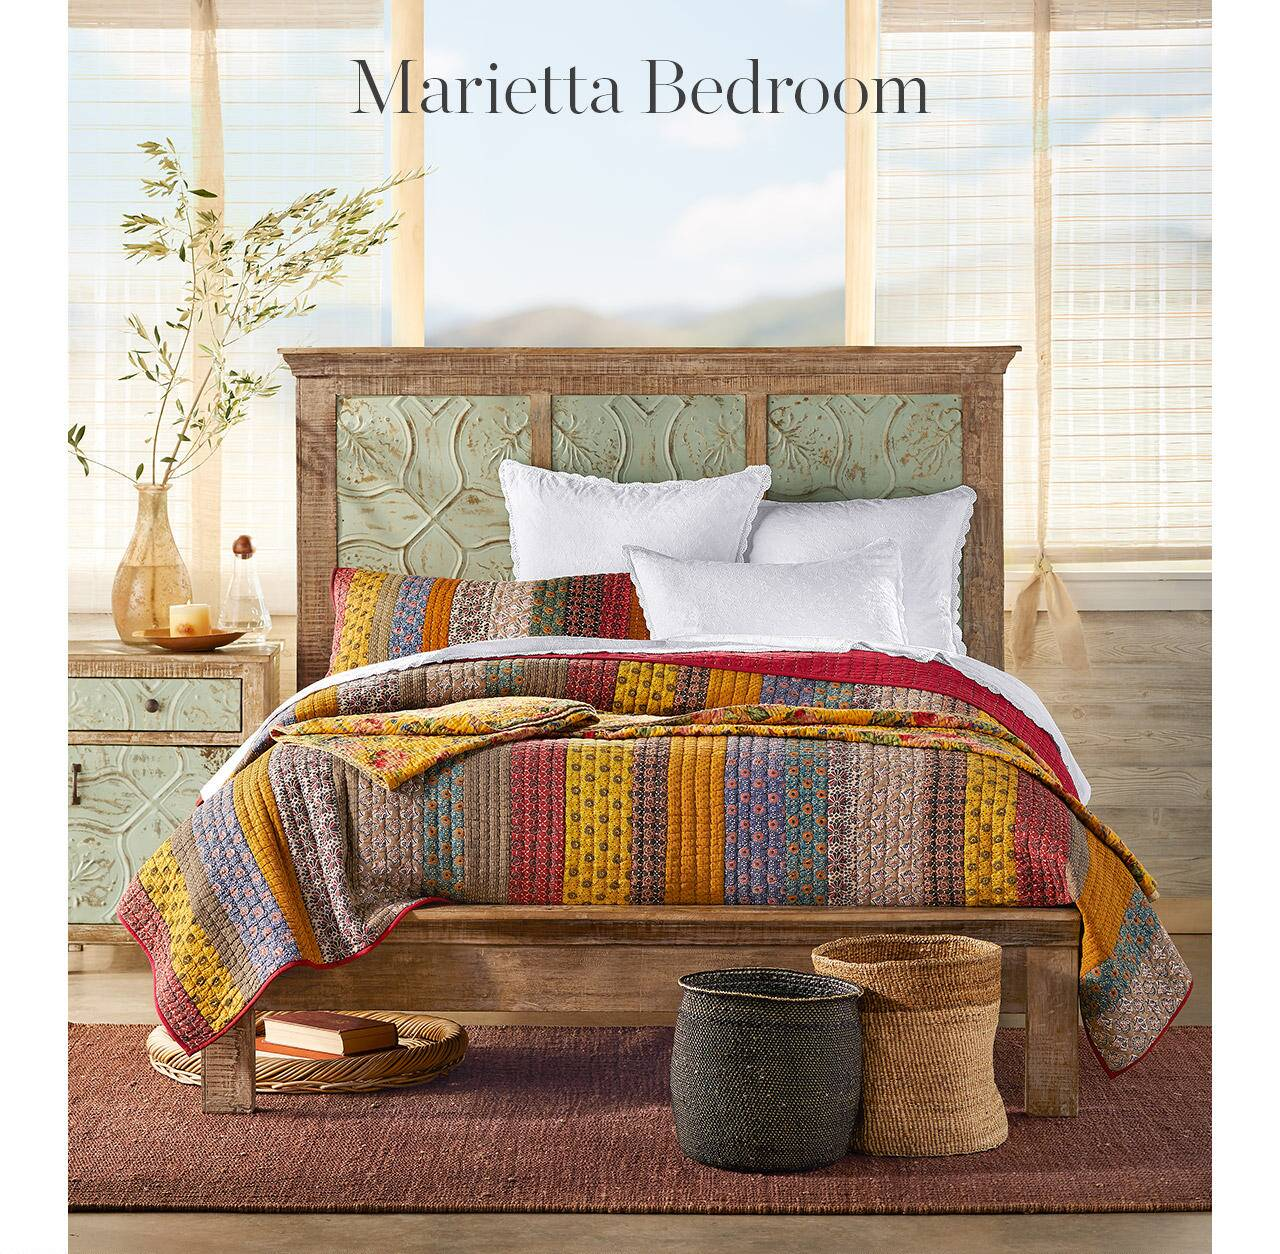 Marietta Bedroom